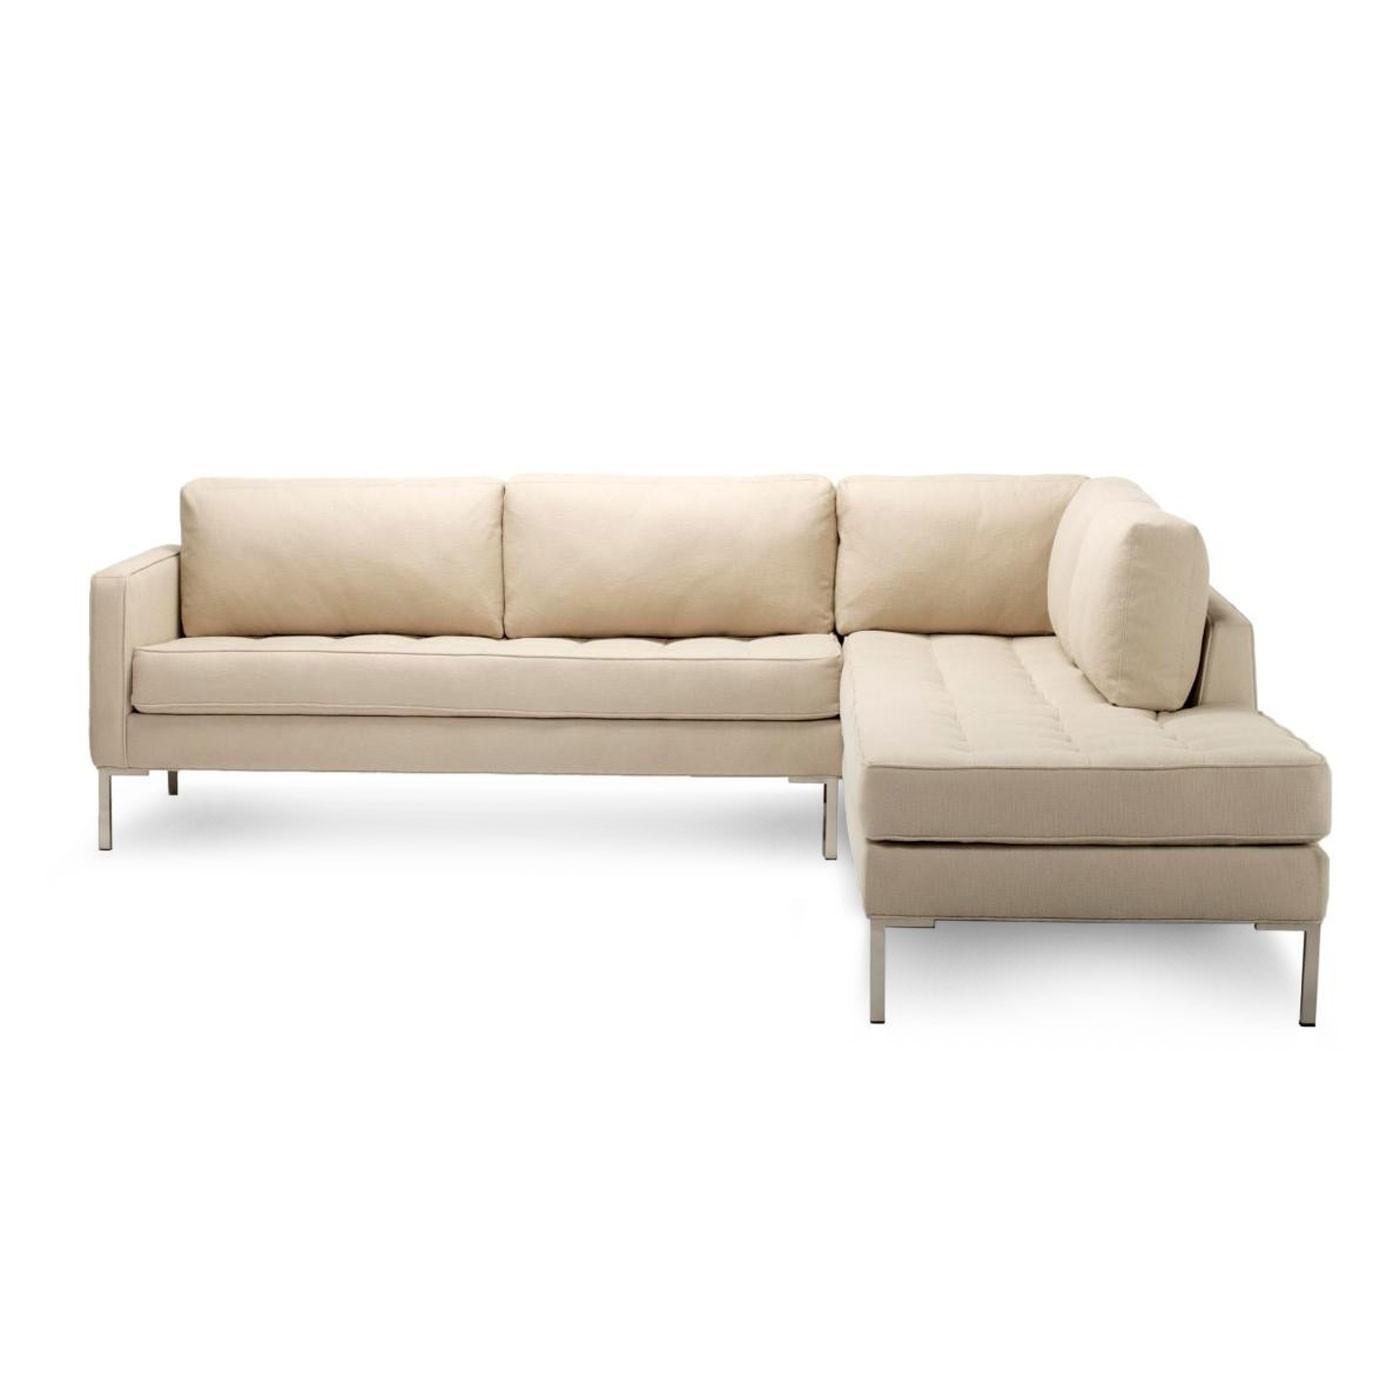 armless sofas bar top behind sofa 20 best small ideas